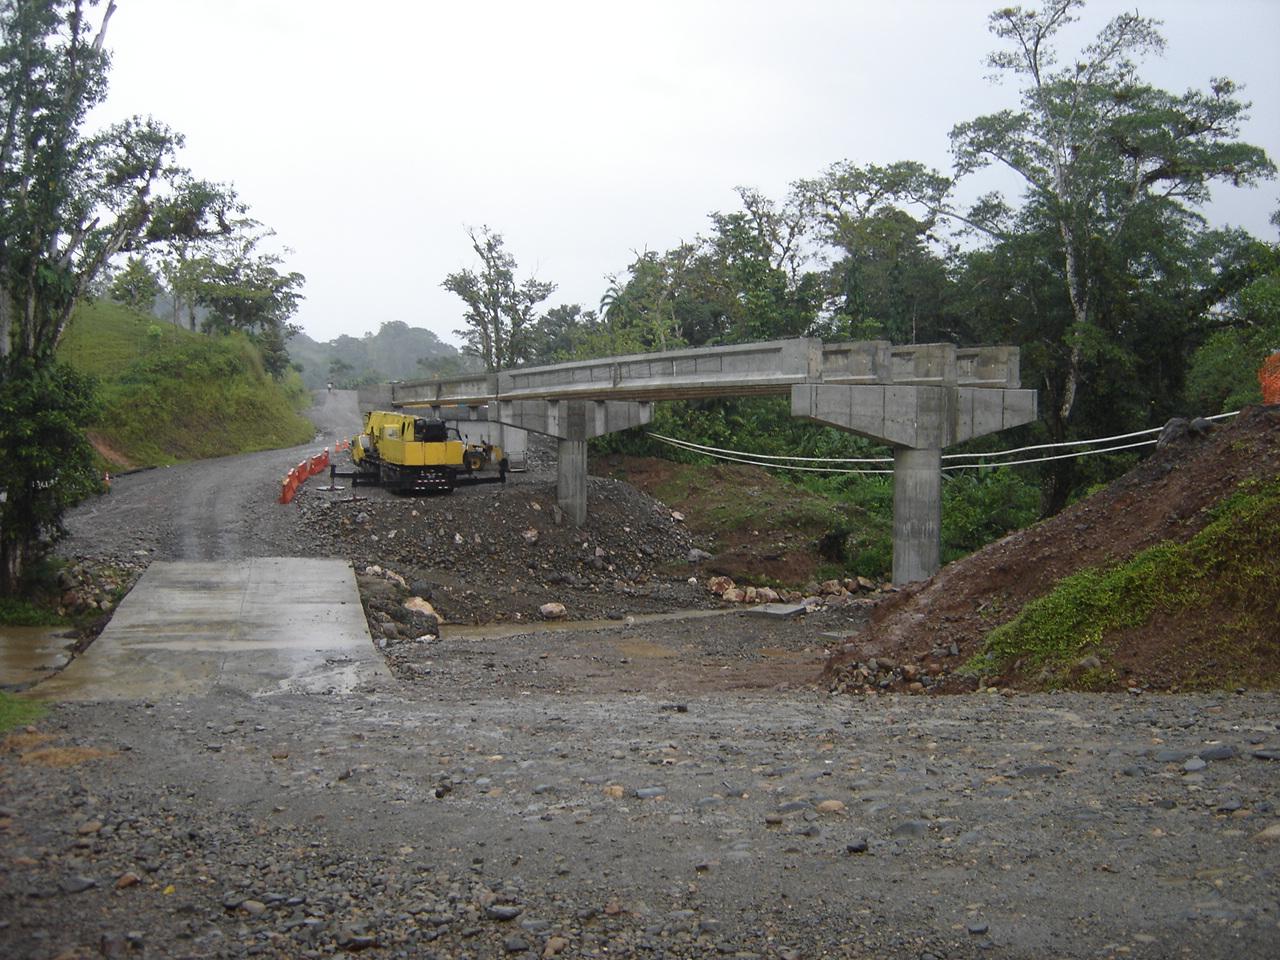 Geotecnia - Geotechnics